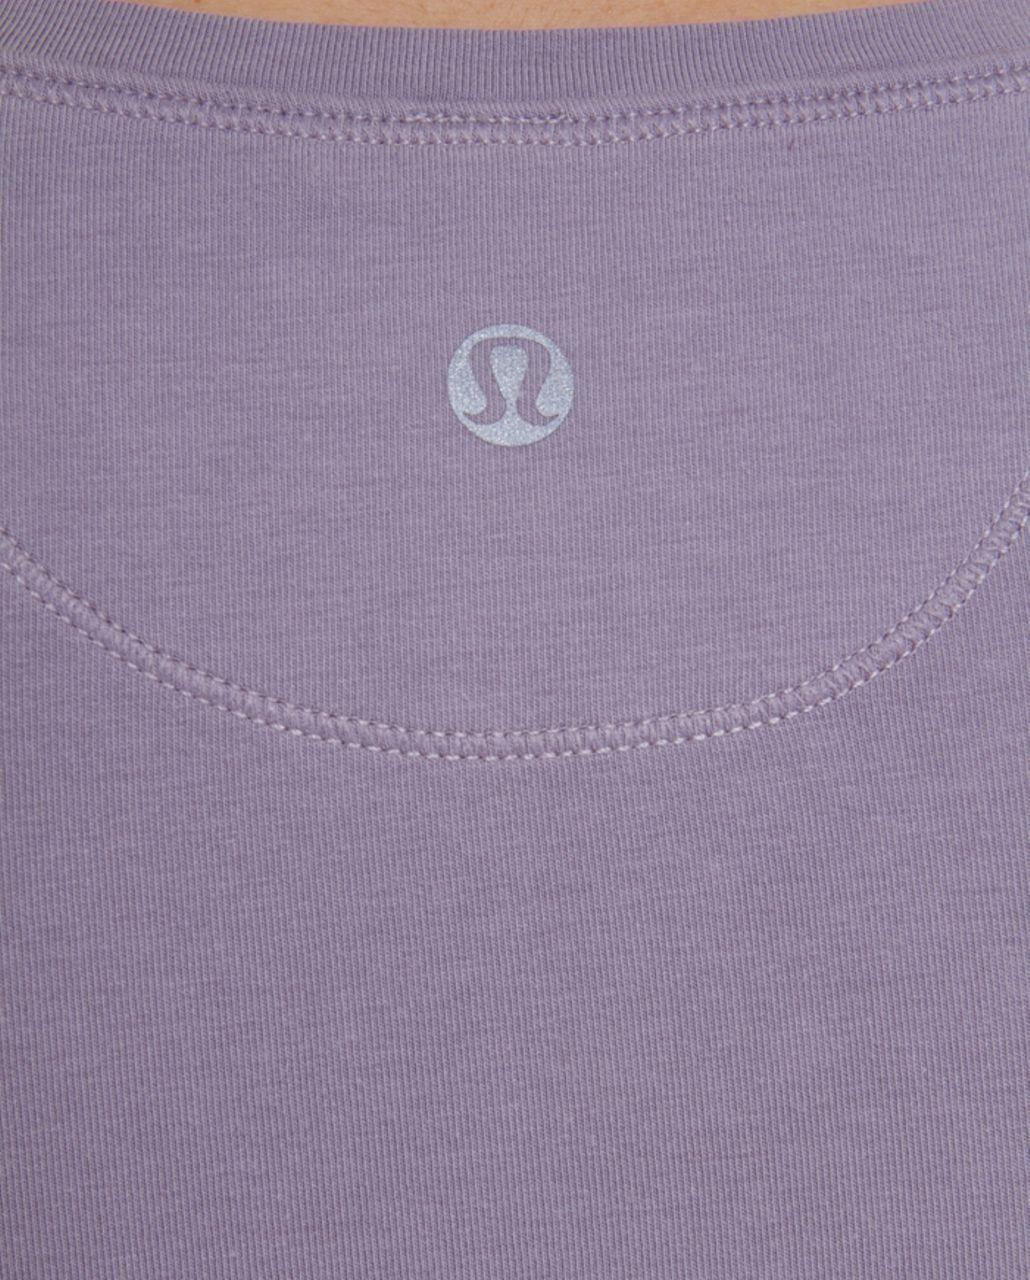 Lululemon Lively Crewneck Tee *Vitasea - Lavender Grey Dip Dye /  Magnum